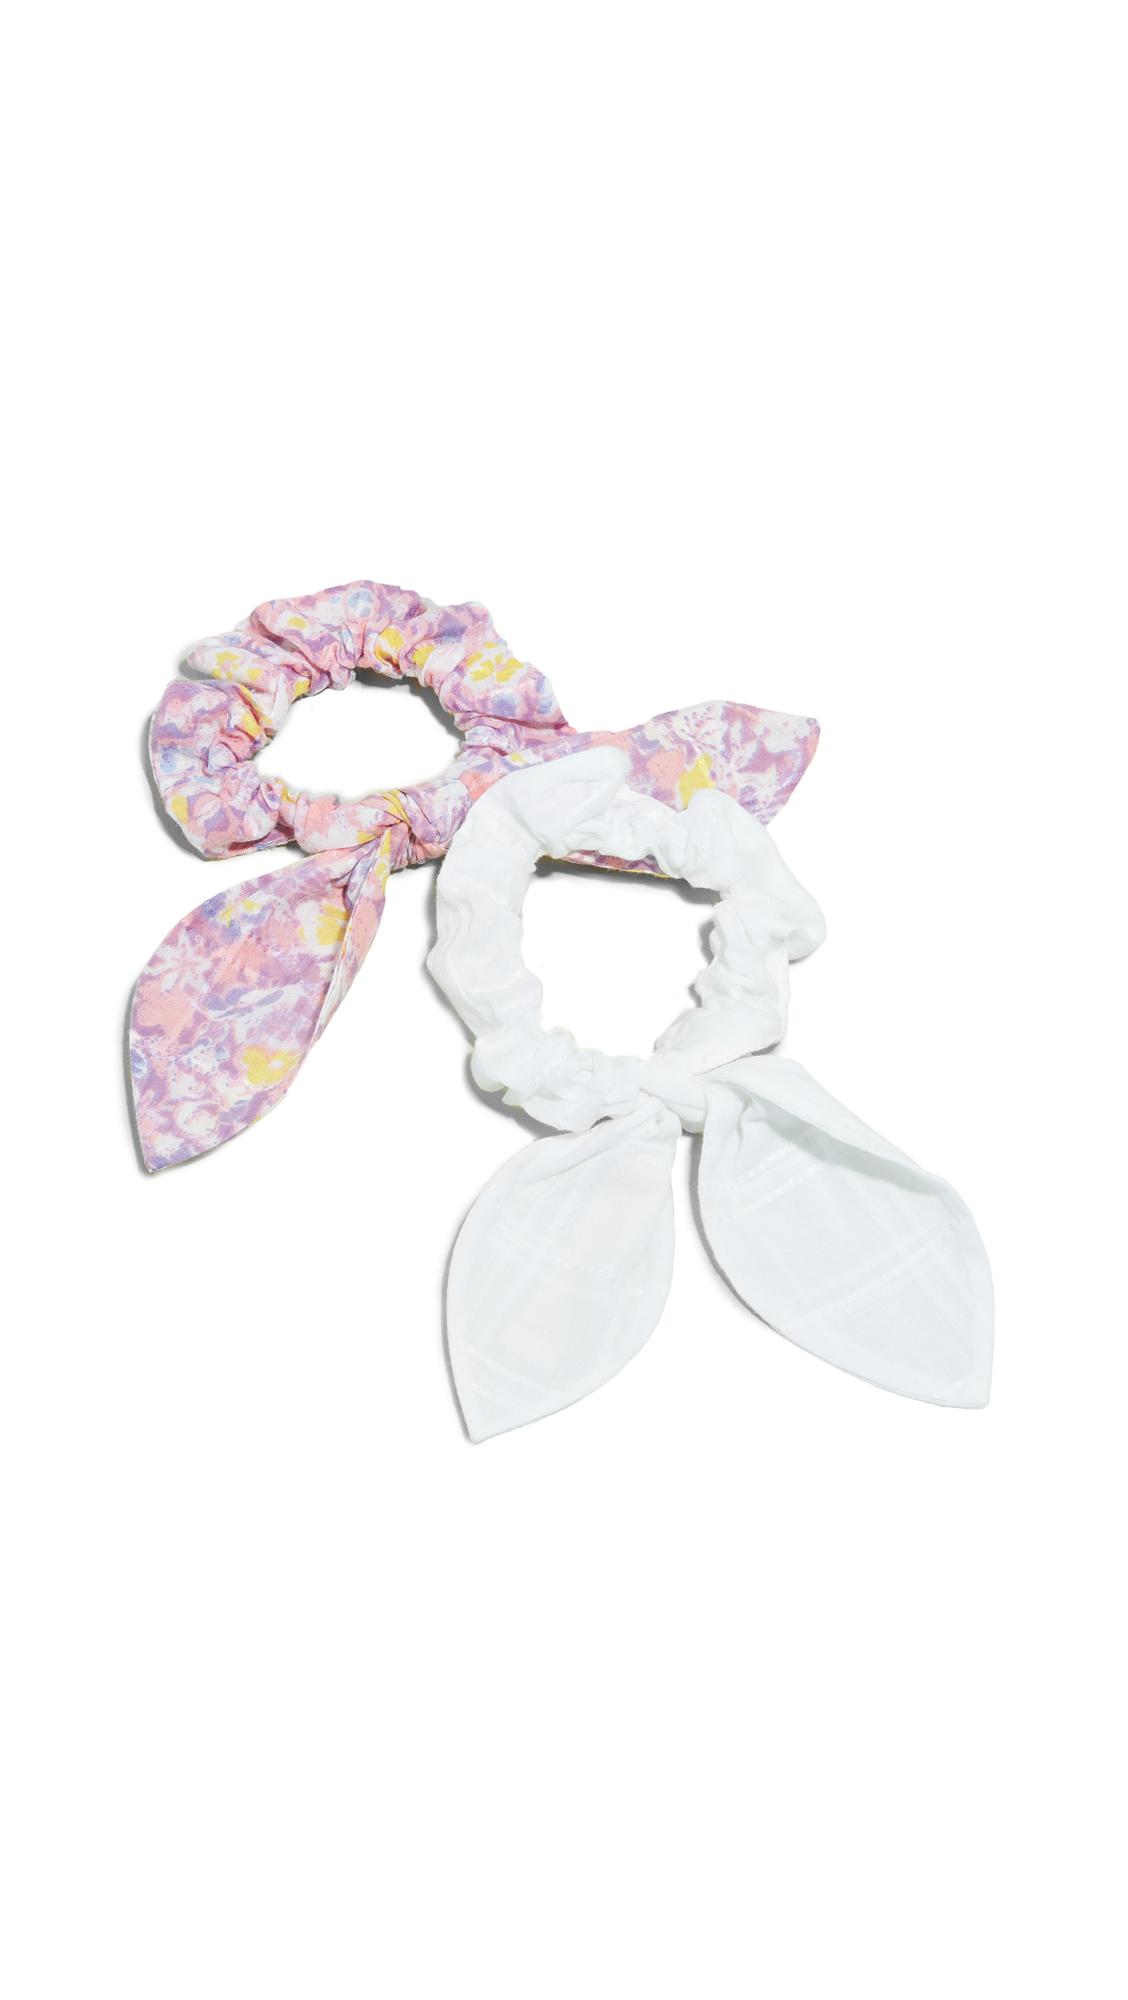 LOVESHACKFANCY Penny Scrunchie Set - White/Jet Set